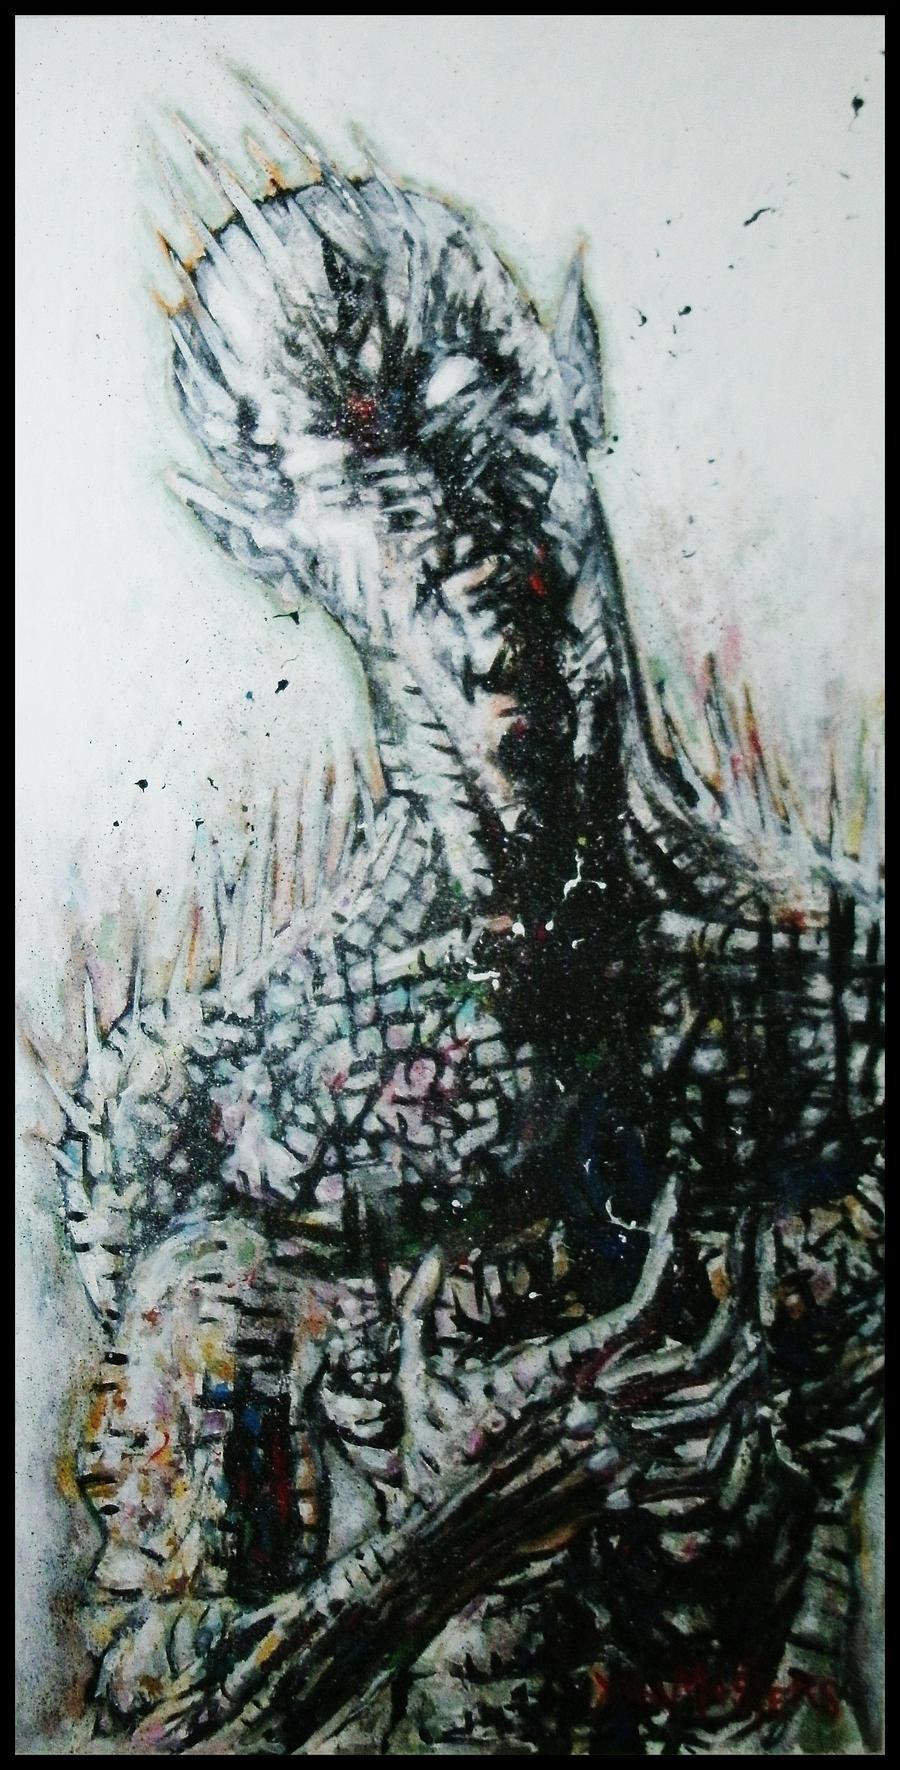 A Demon Emerges by Arum1966